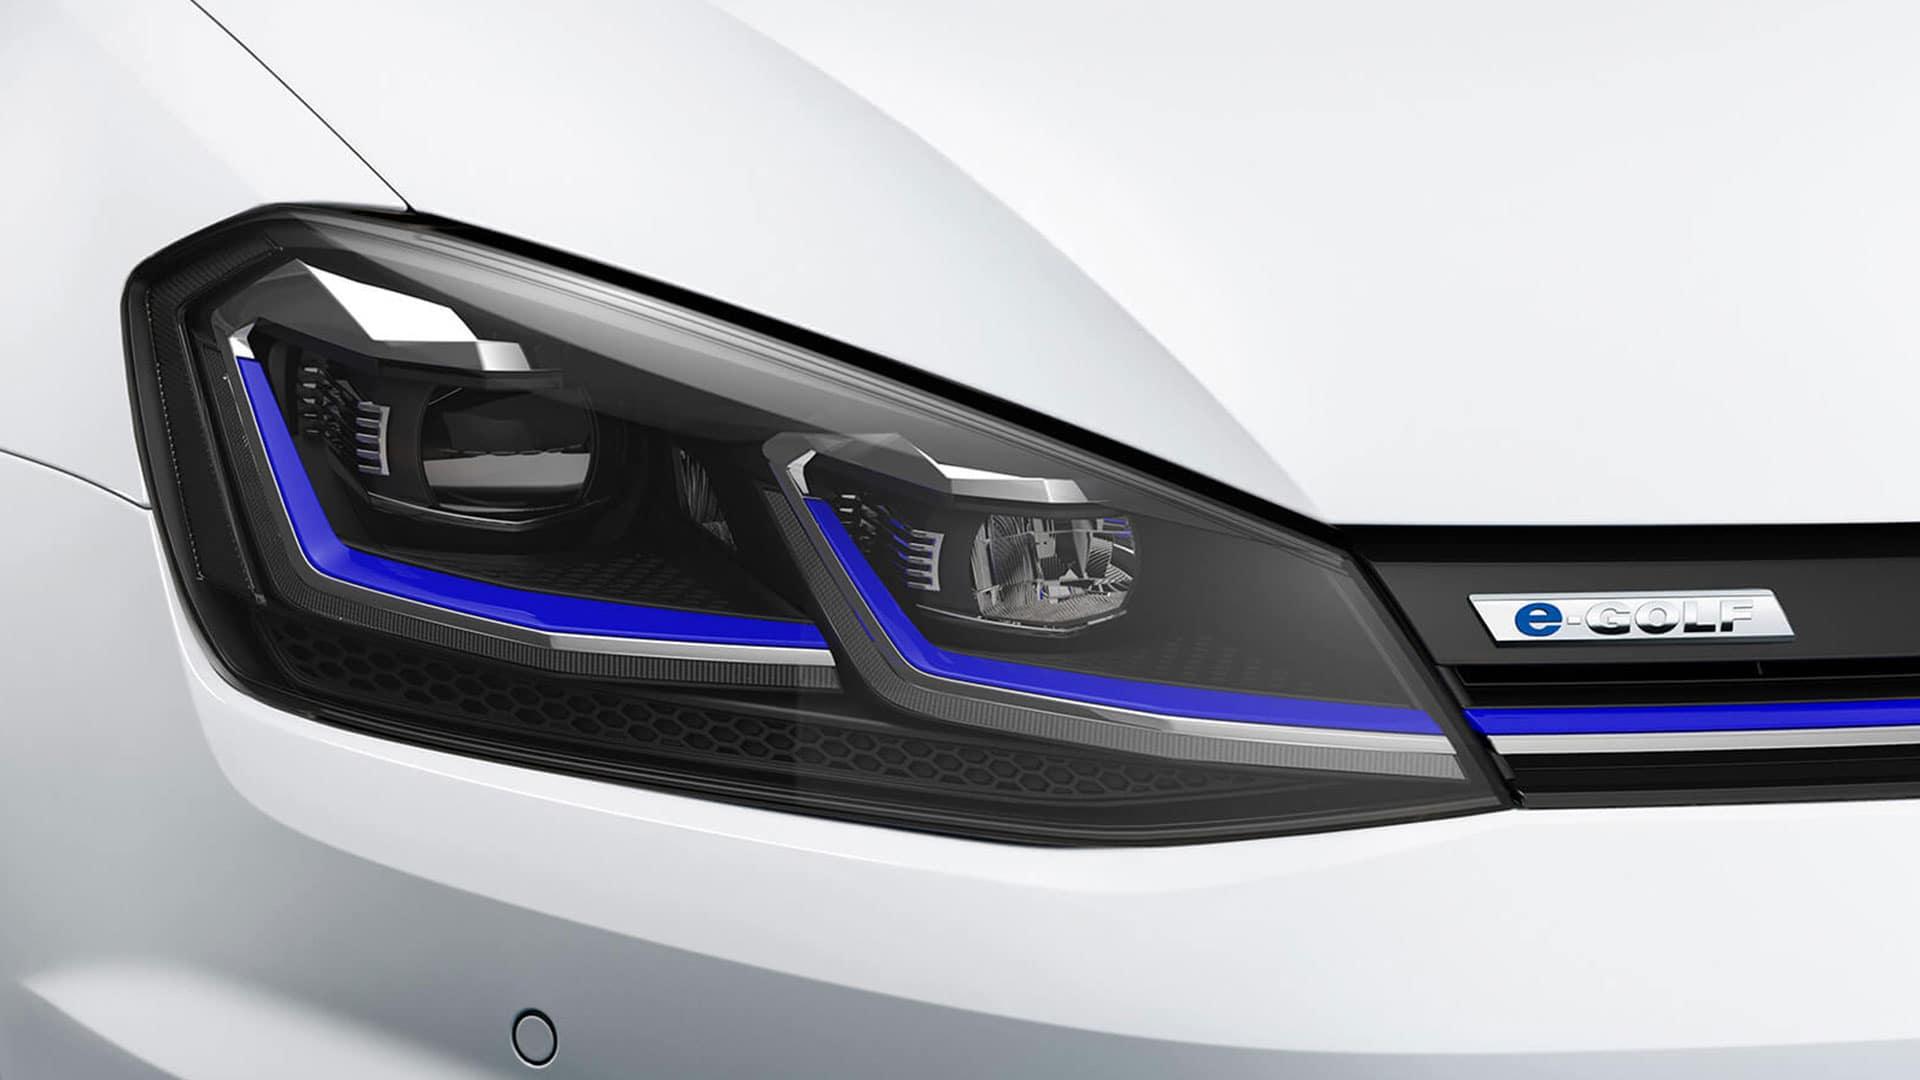 2019 VW e-Golf LED headlights